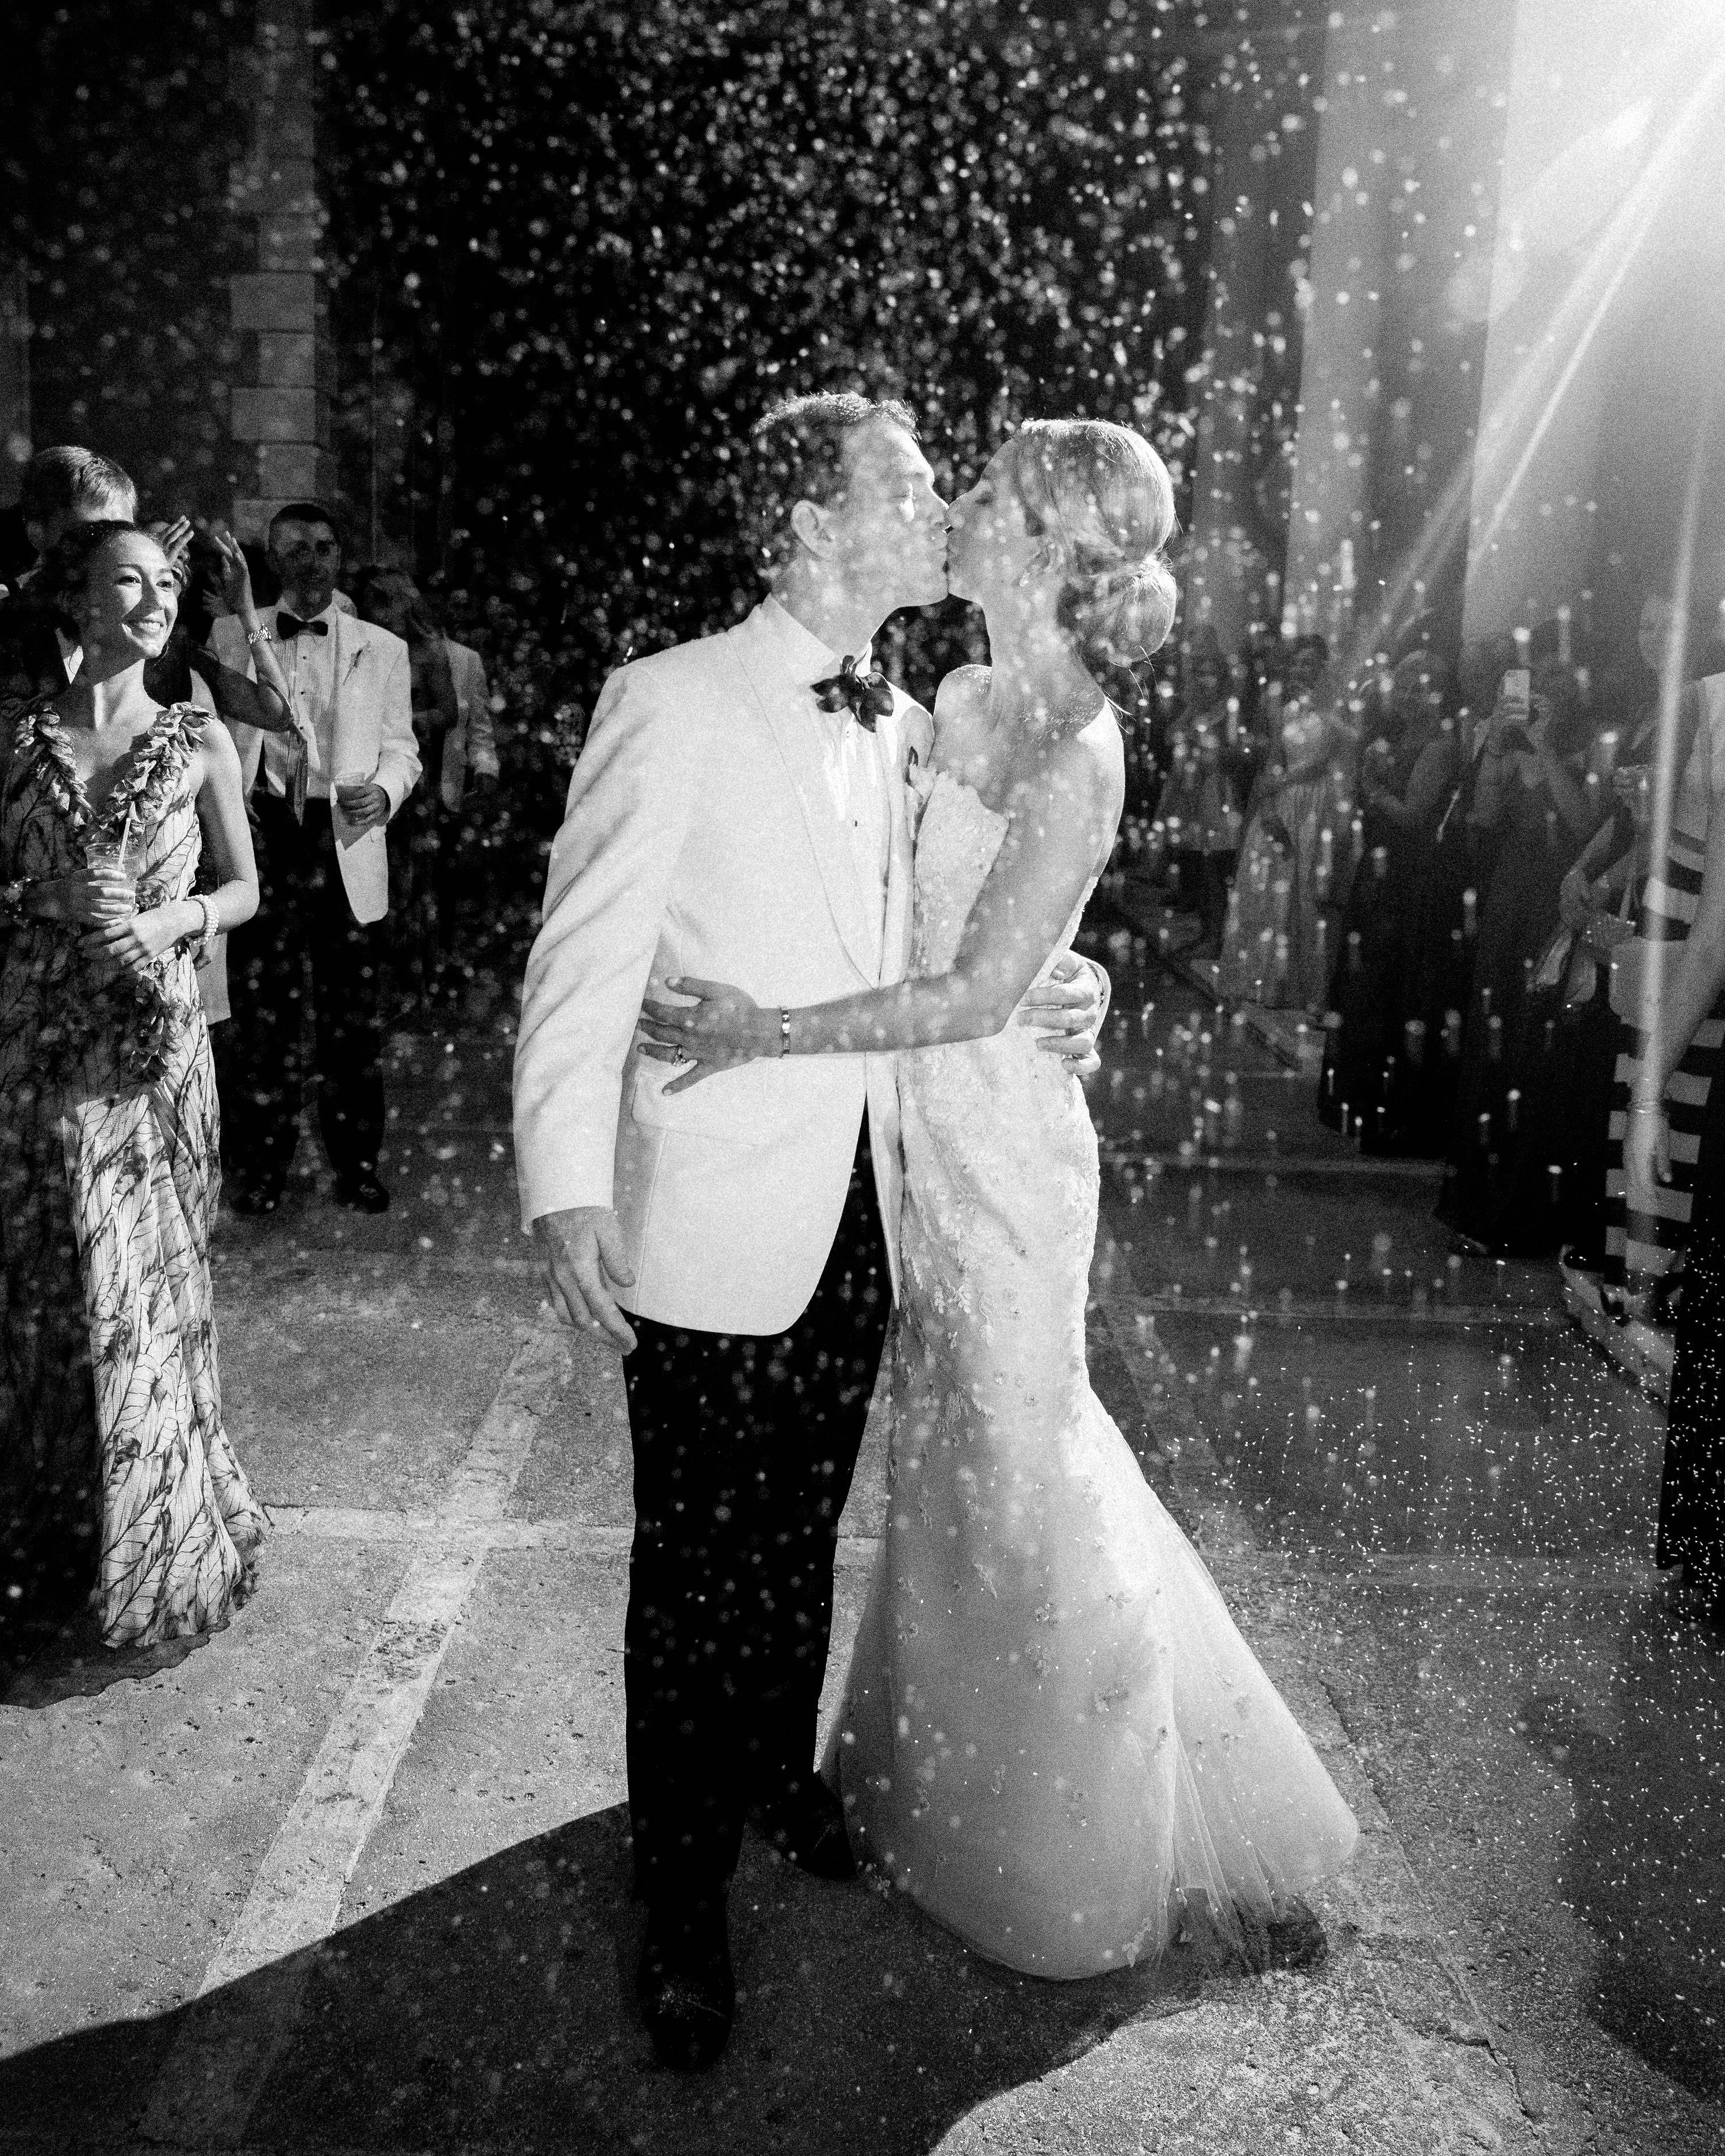 kelsey-casey-wedding-bahamas-0261-1719-s112804.jpg